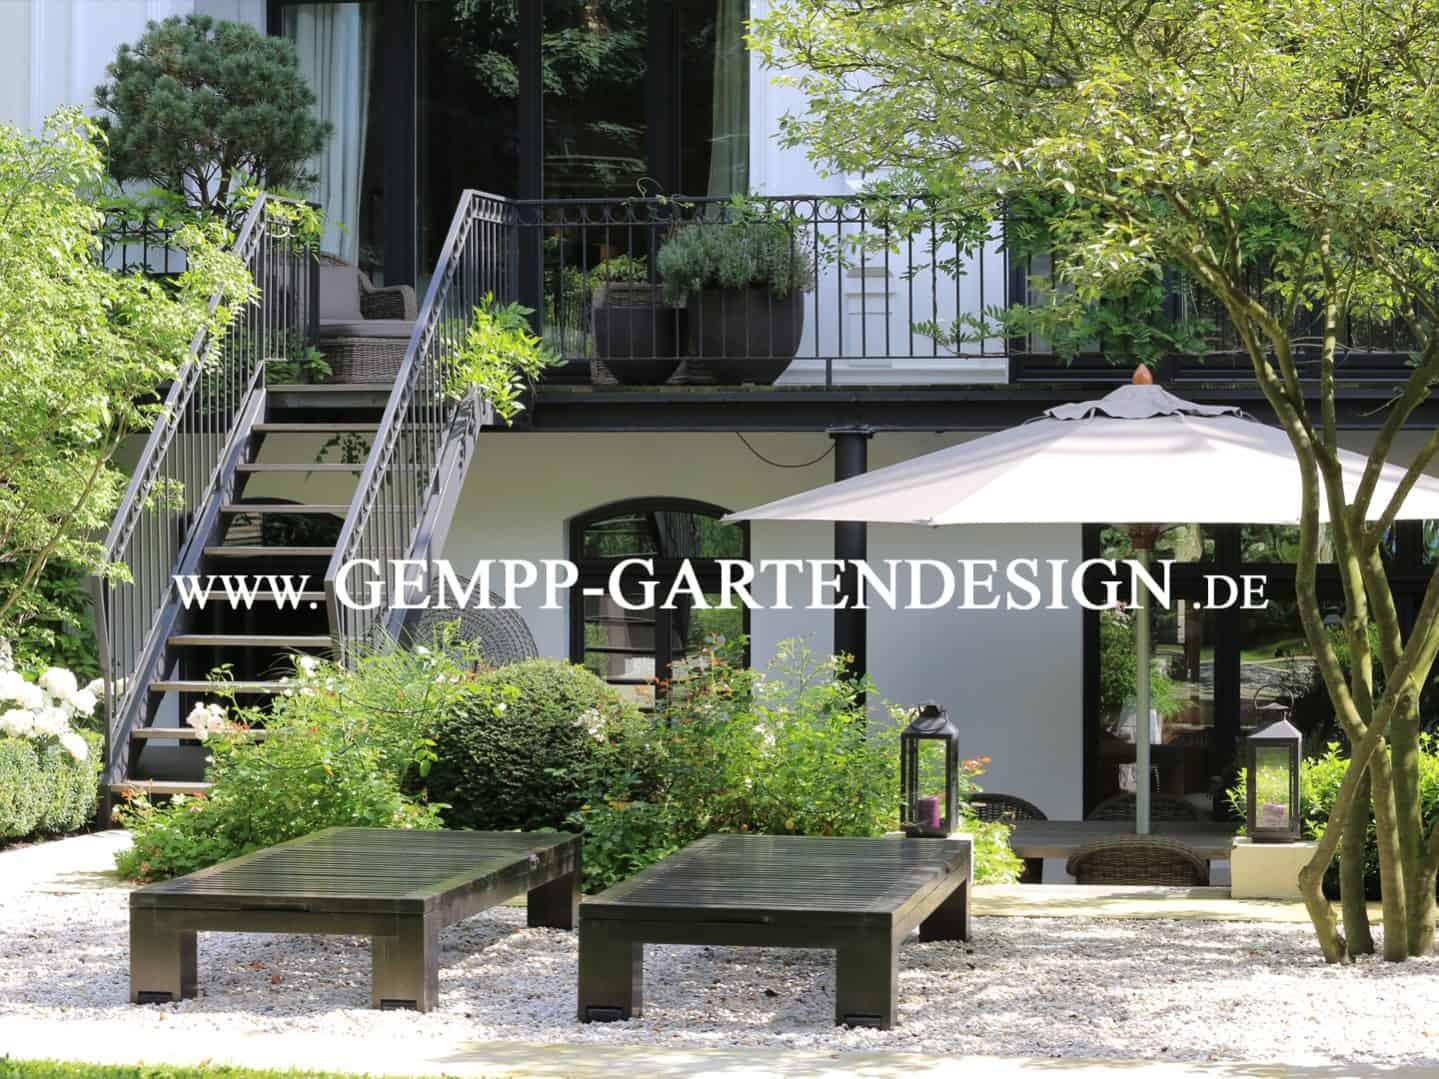 Gartenumgestaltung Garten umgestalten Ideen Bilder Fotos